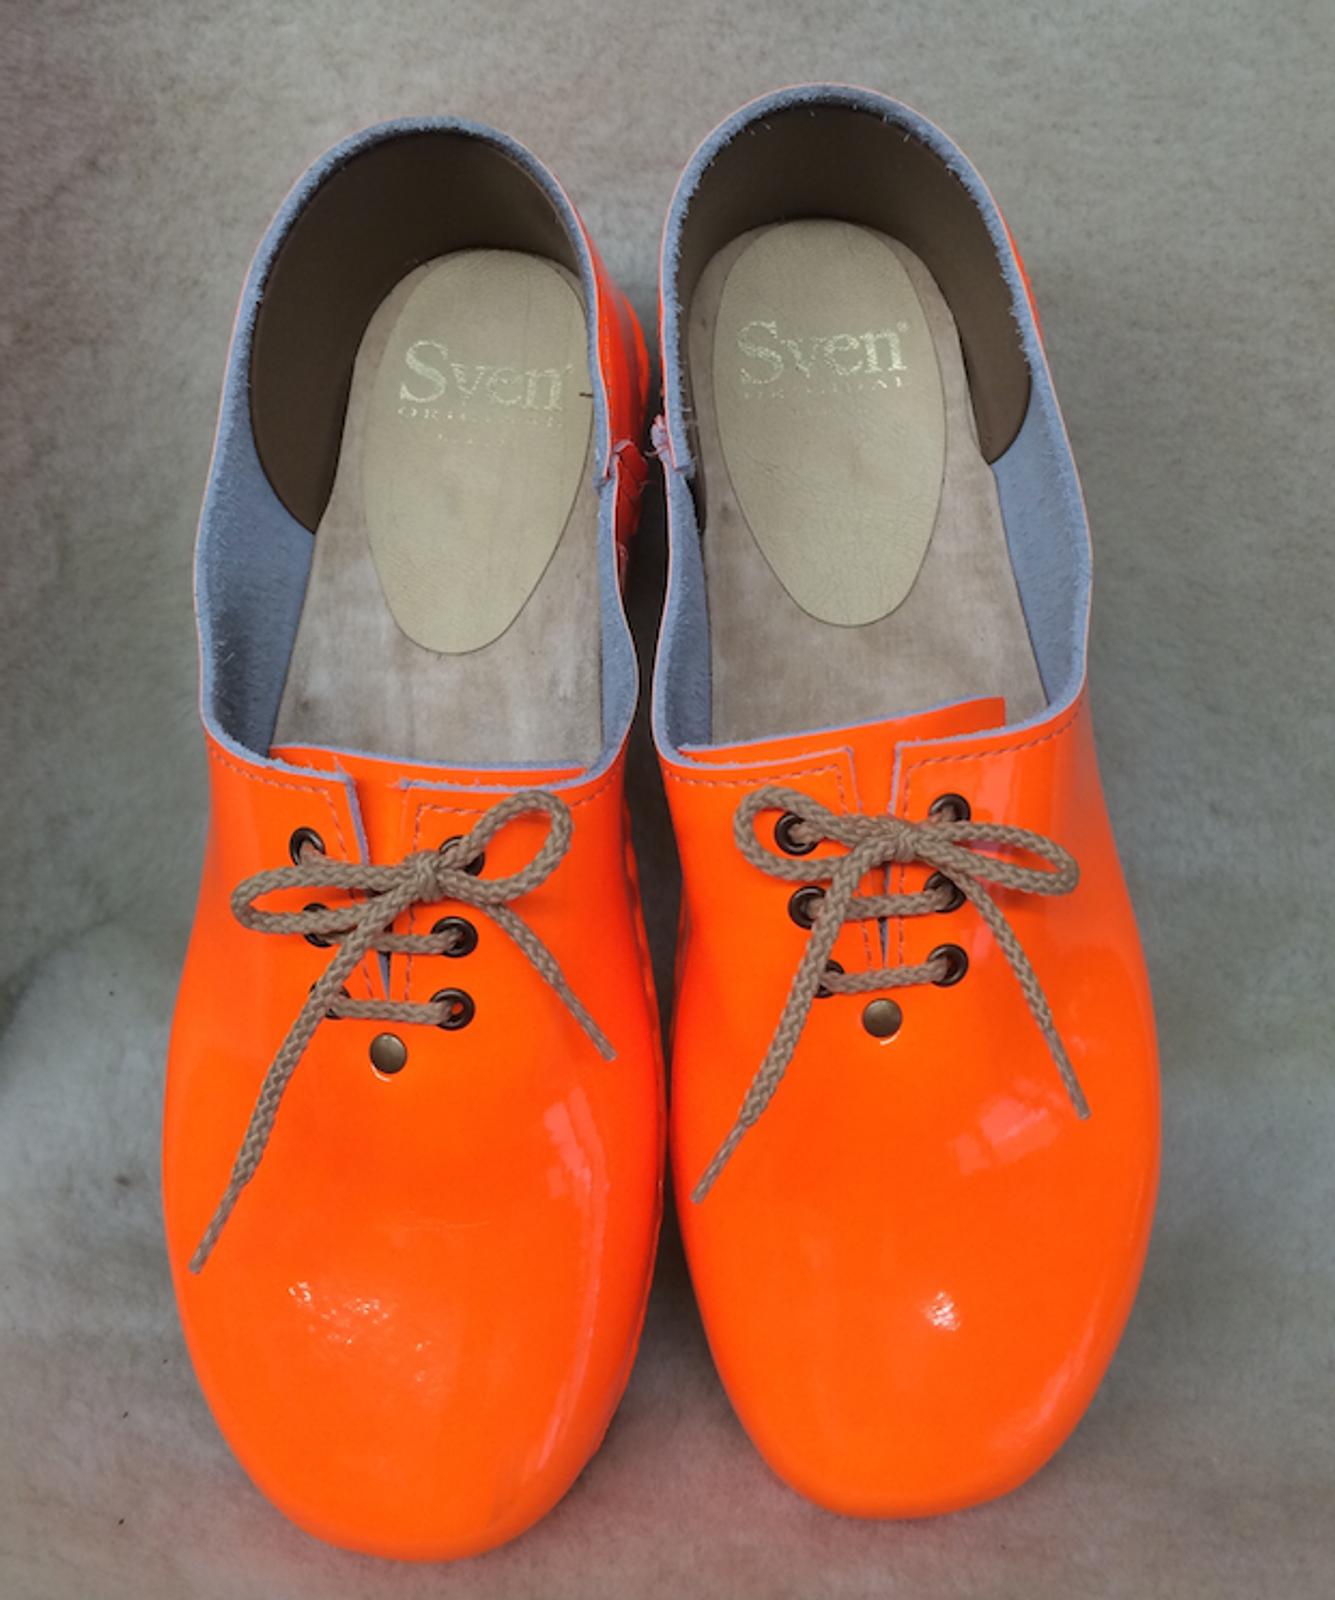 Neon Orange - Tie Clogs - Closed Back